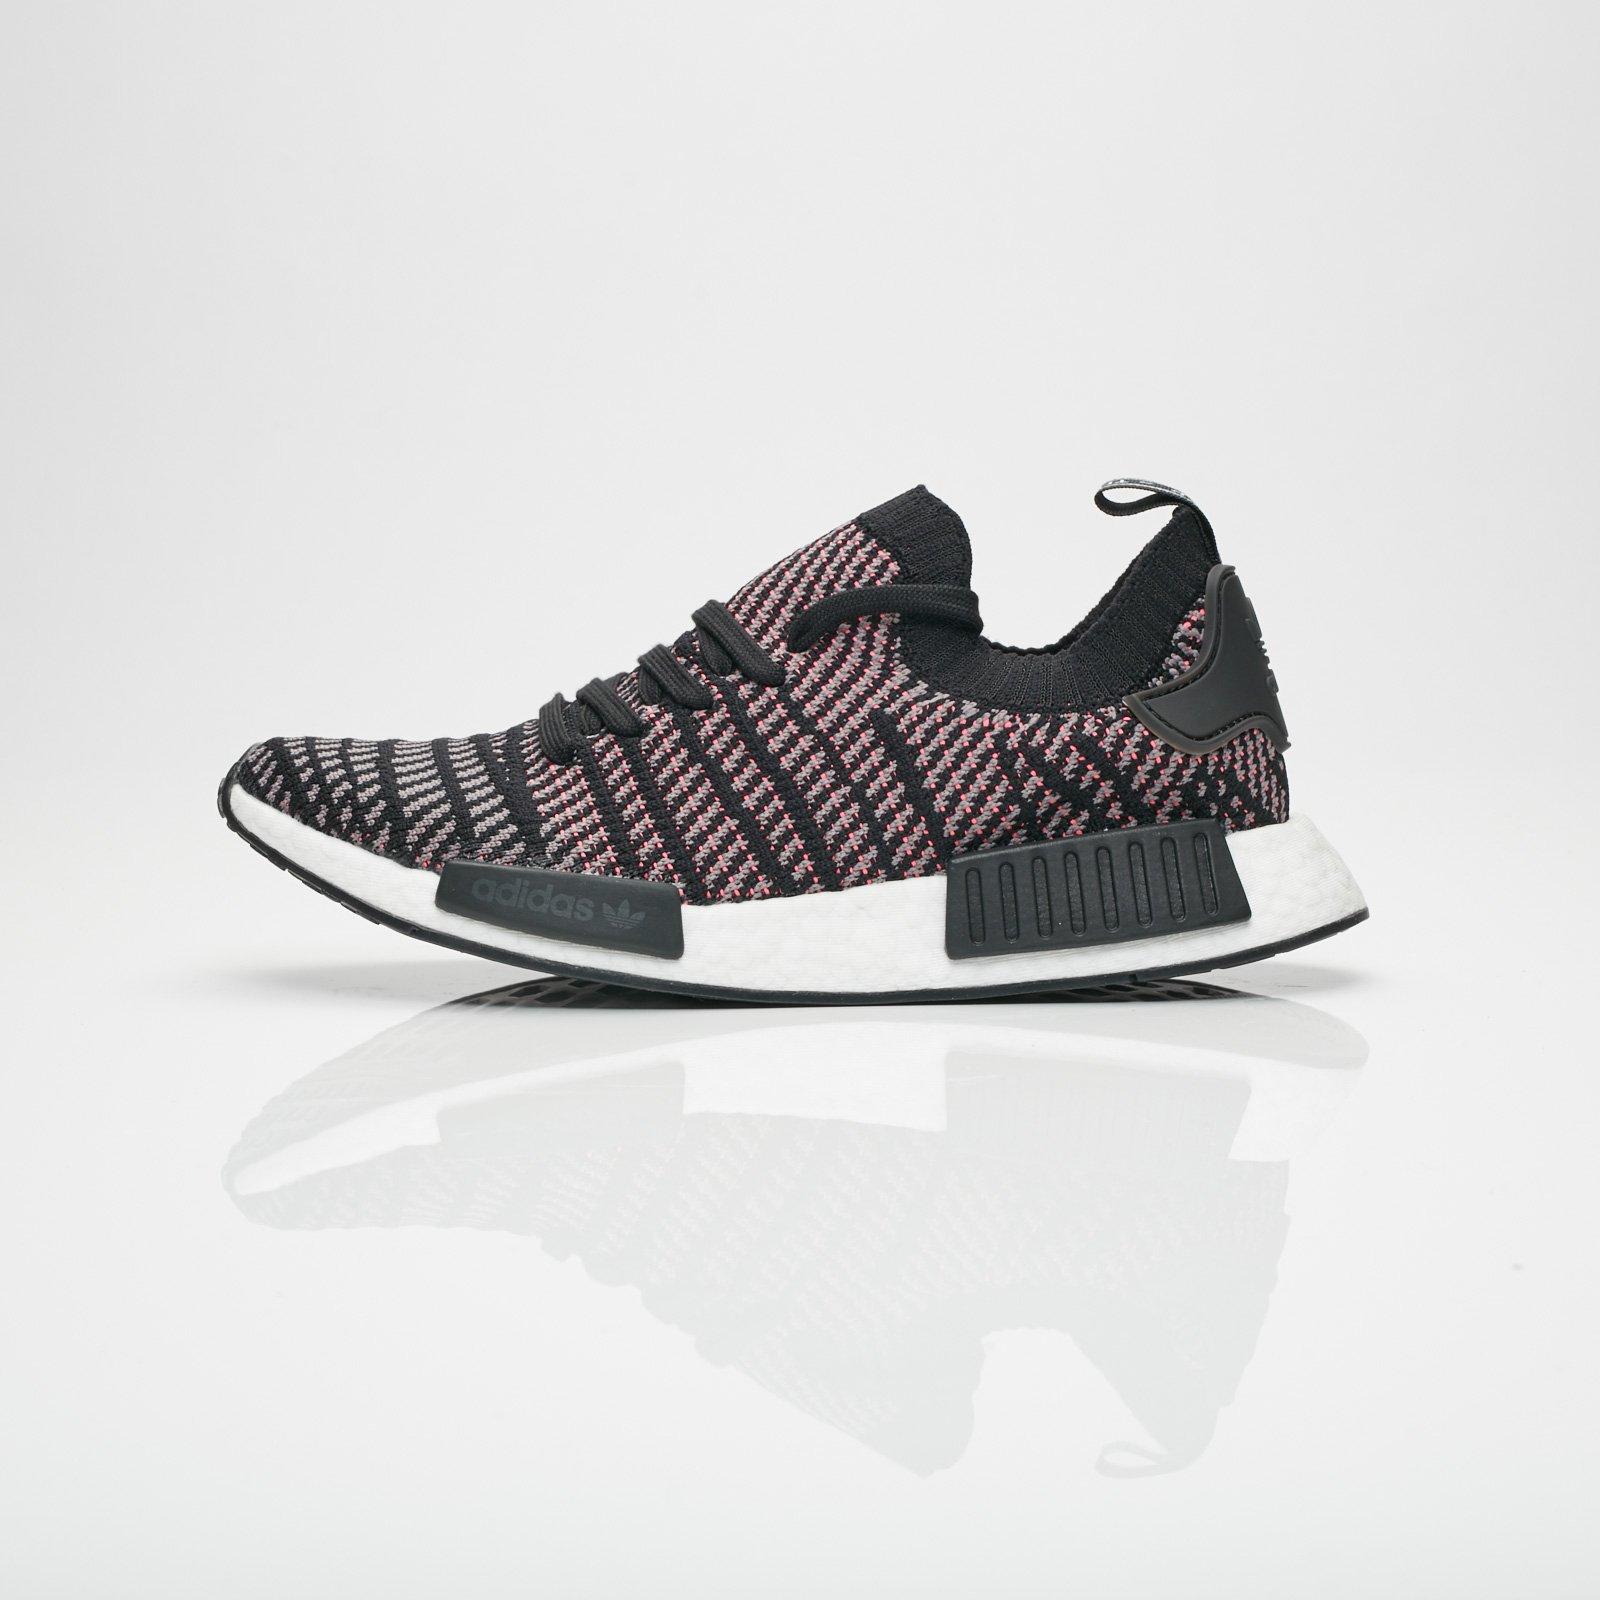 35cbd99be adidas NMD R1 STLT Primeknit - Cq2386 - Sneakersnstuff